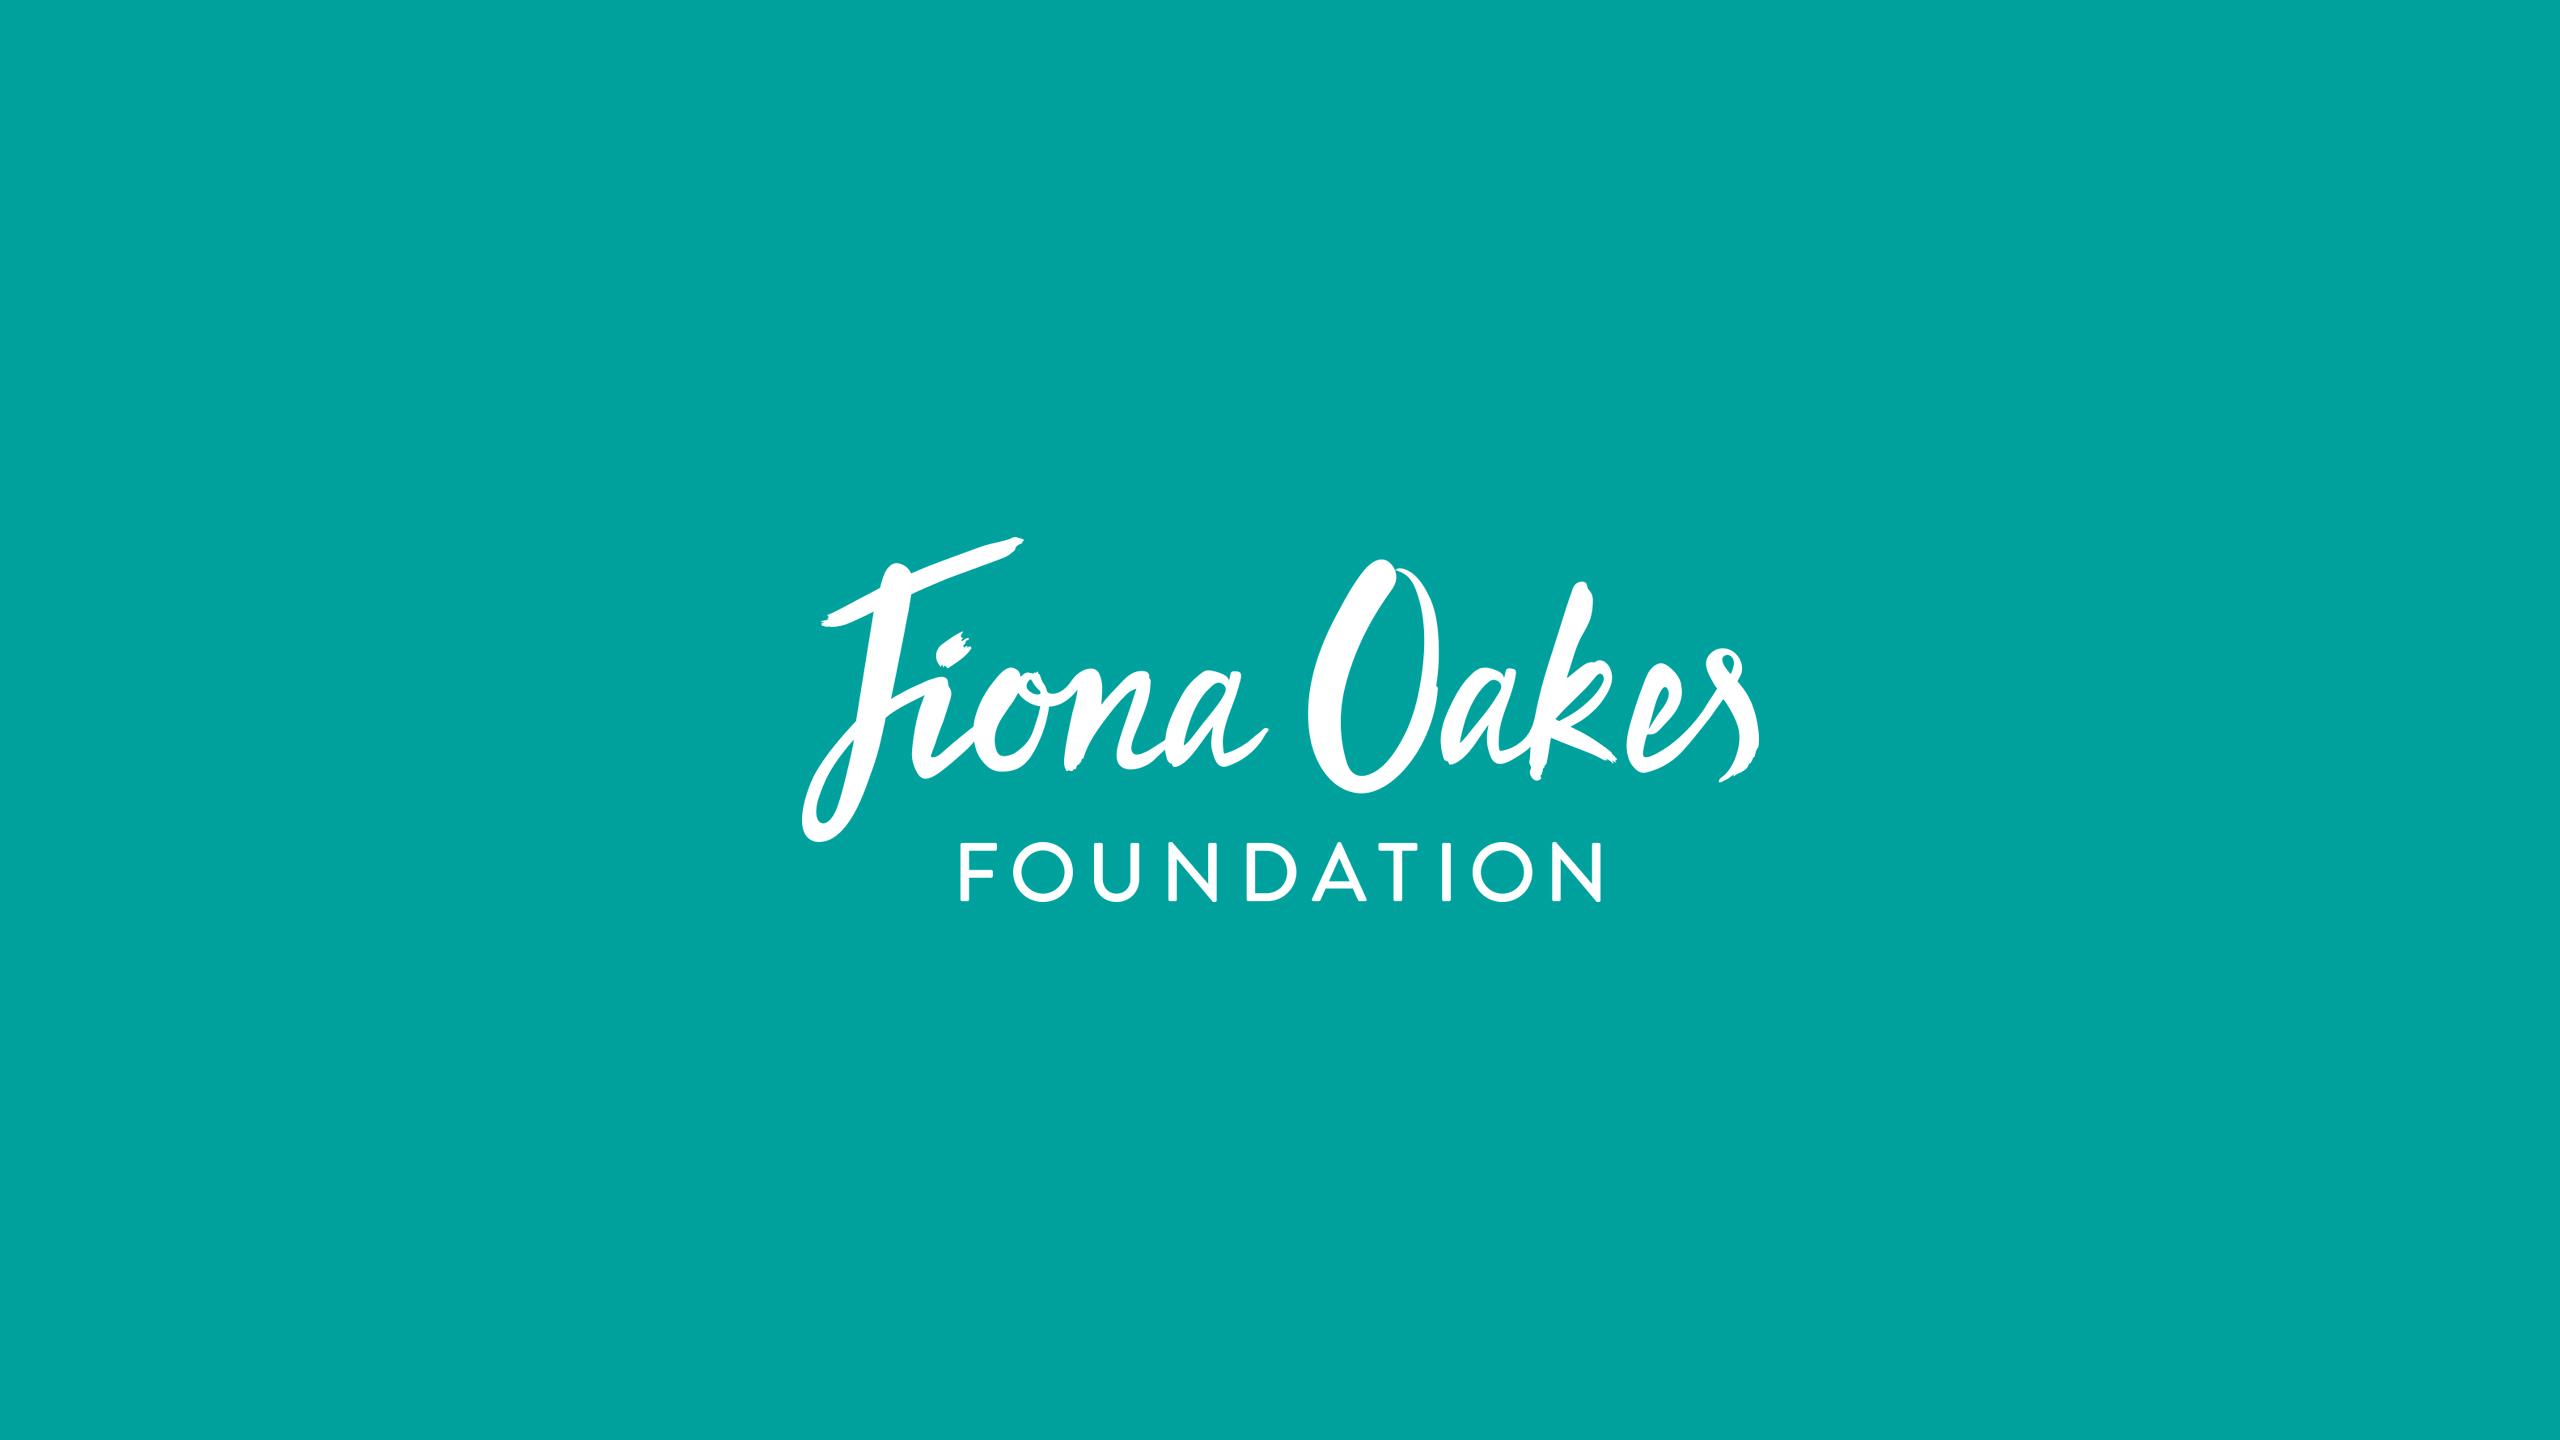 Fiona Oakes Foundation – Anna-Marie Marshall